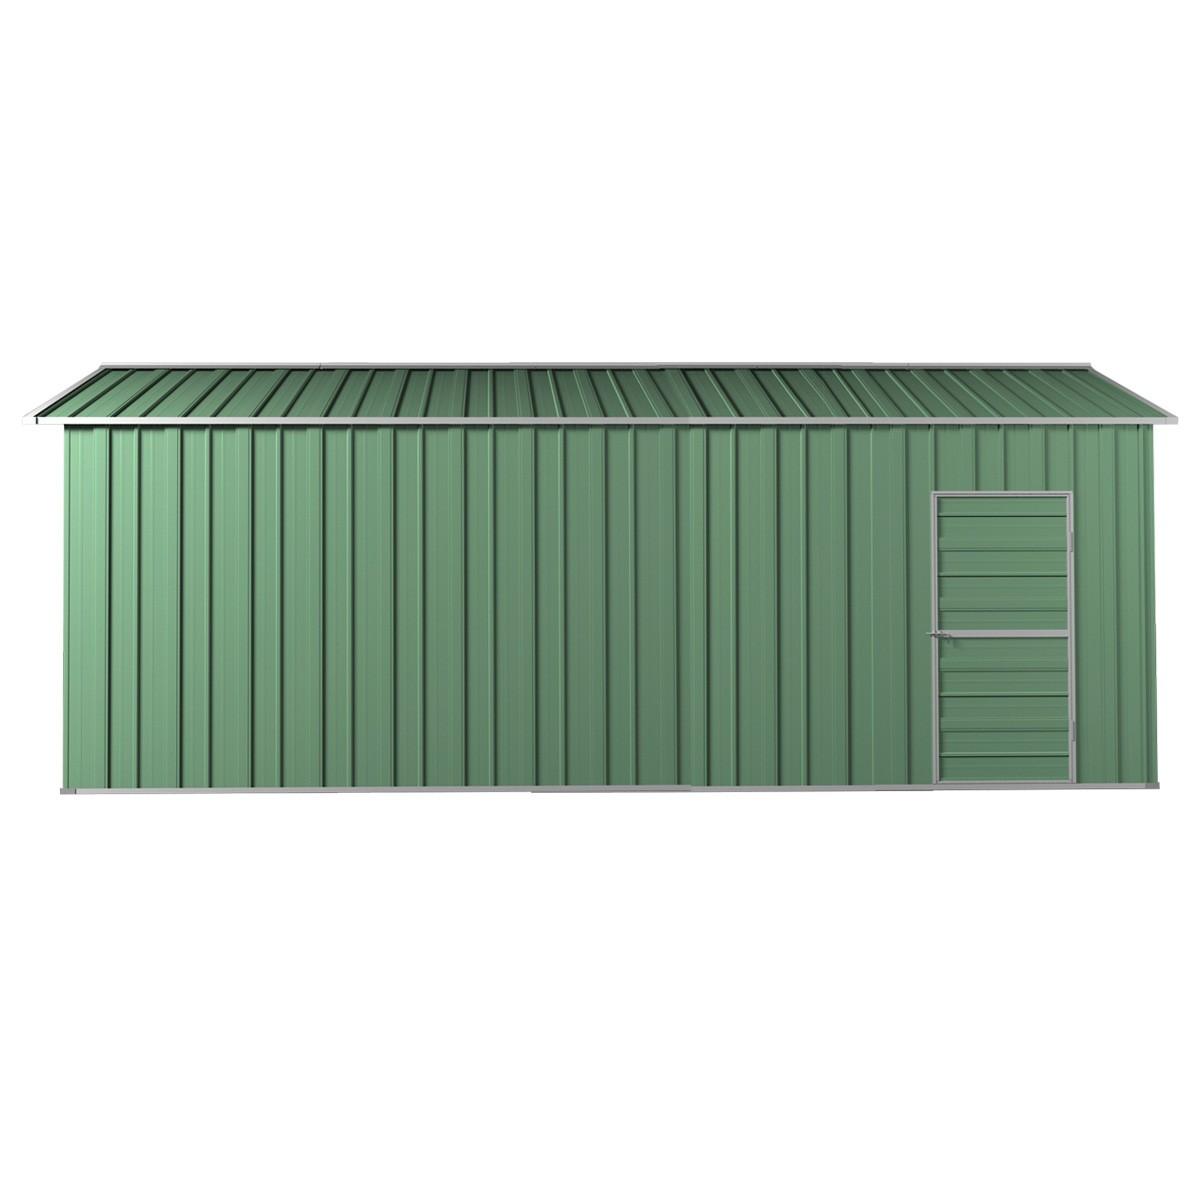 Roller door garage shed x x 3m gable workshop for Shed with garage door